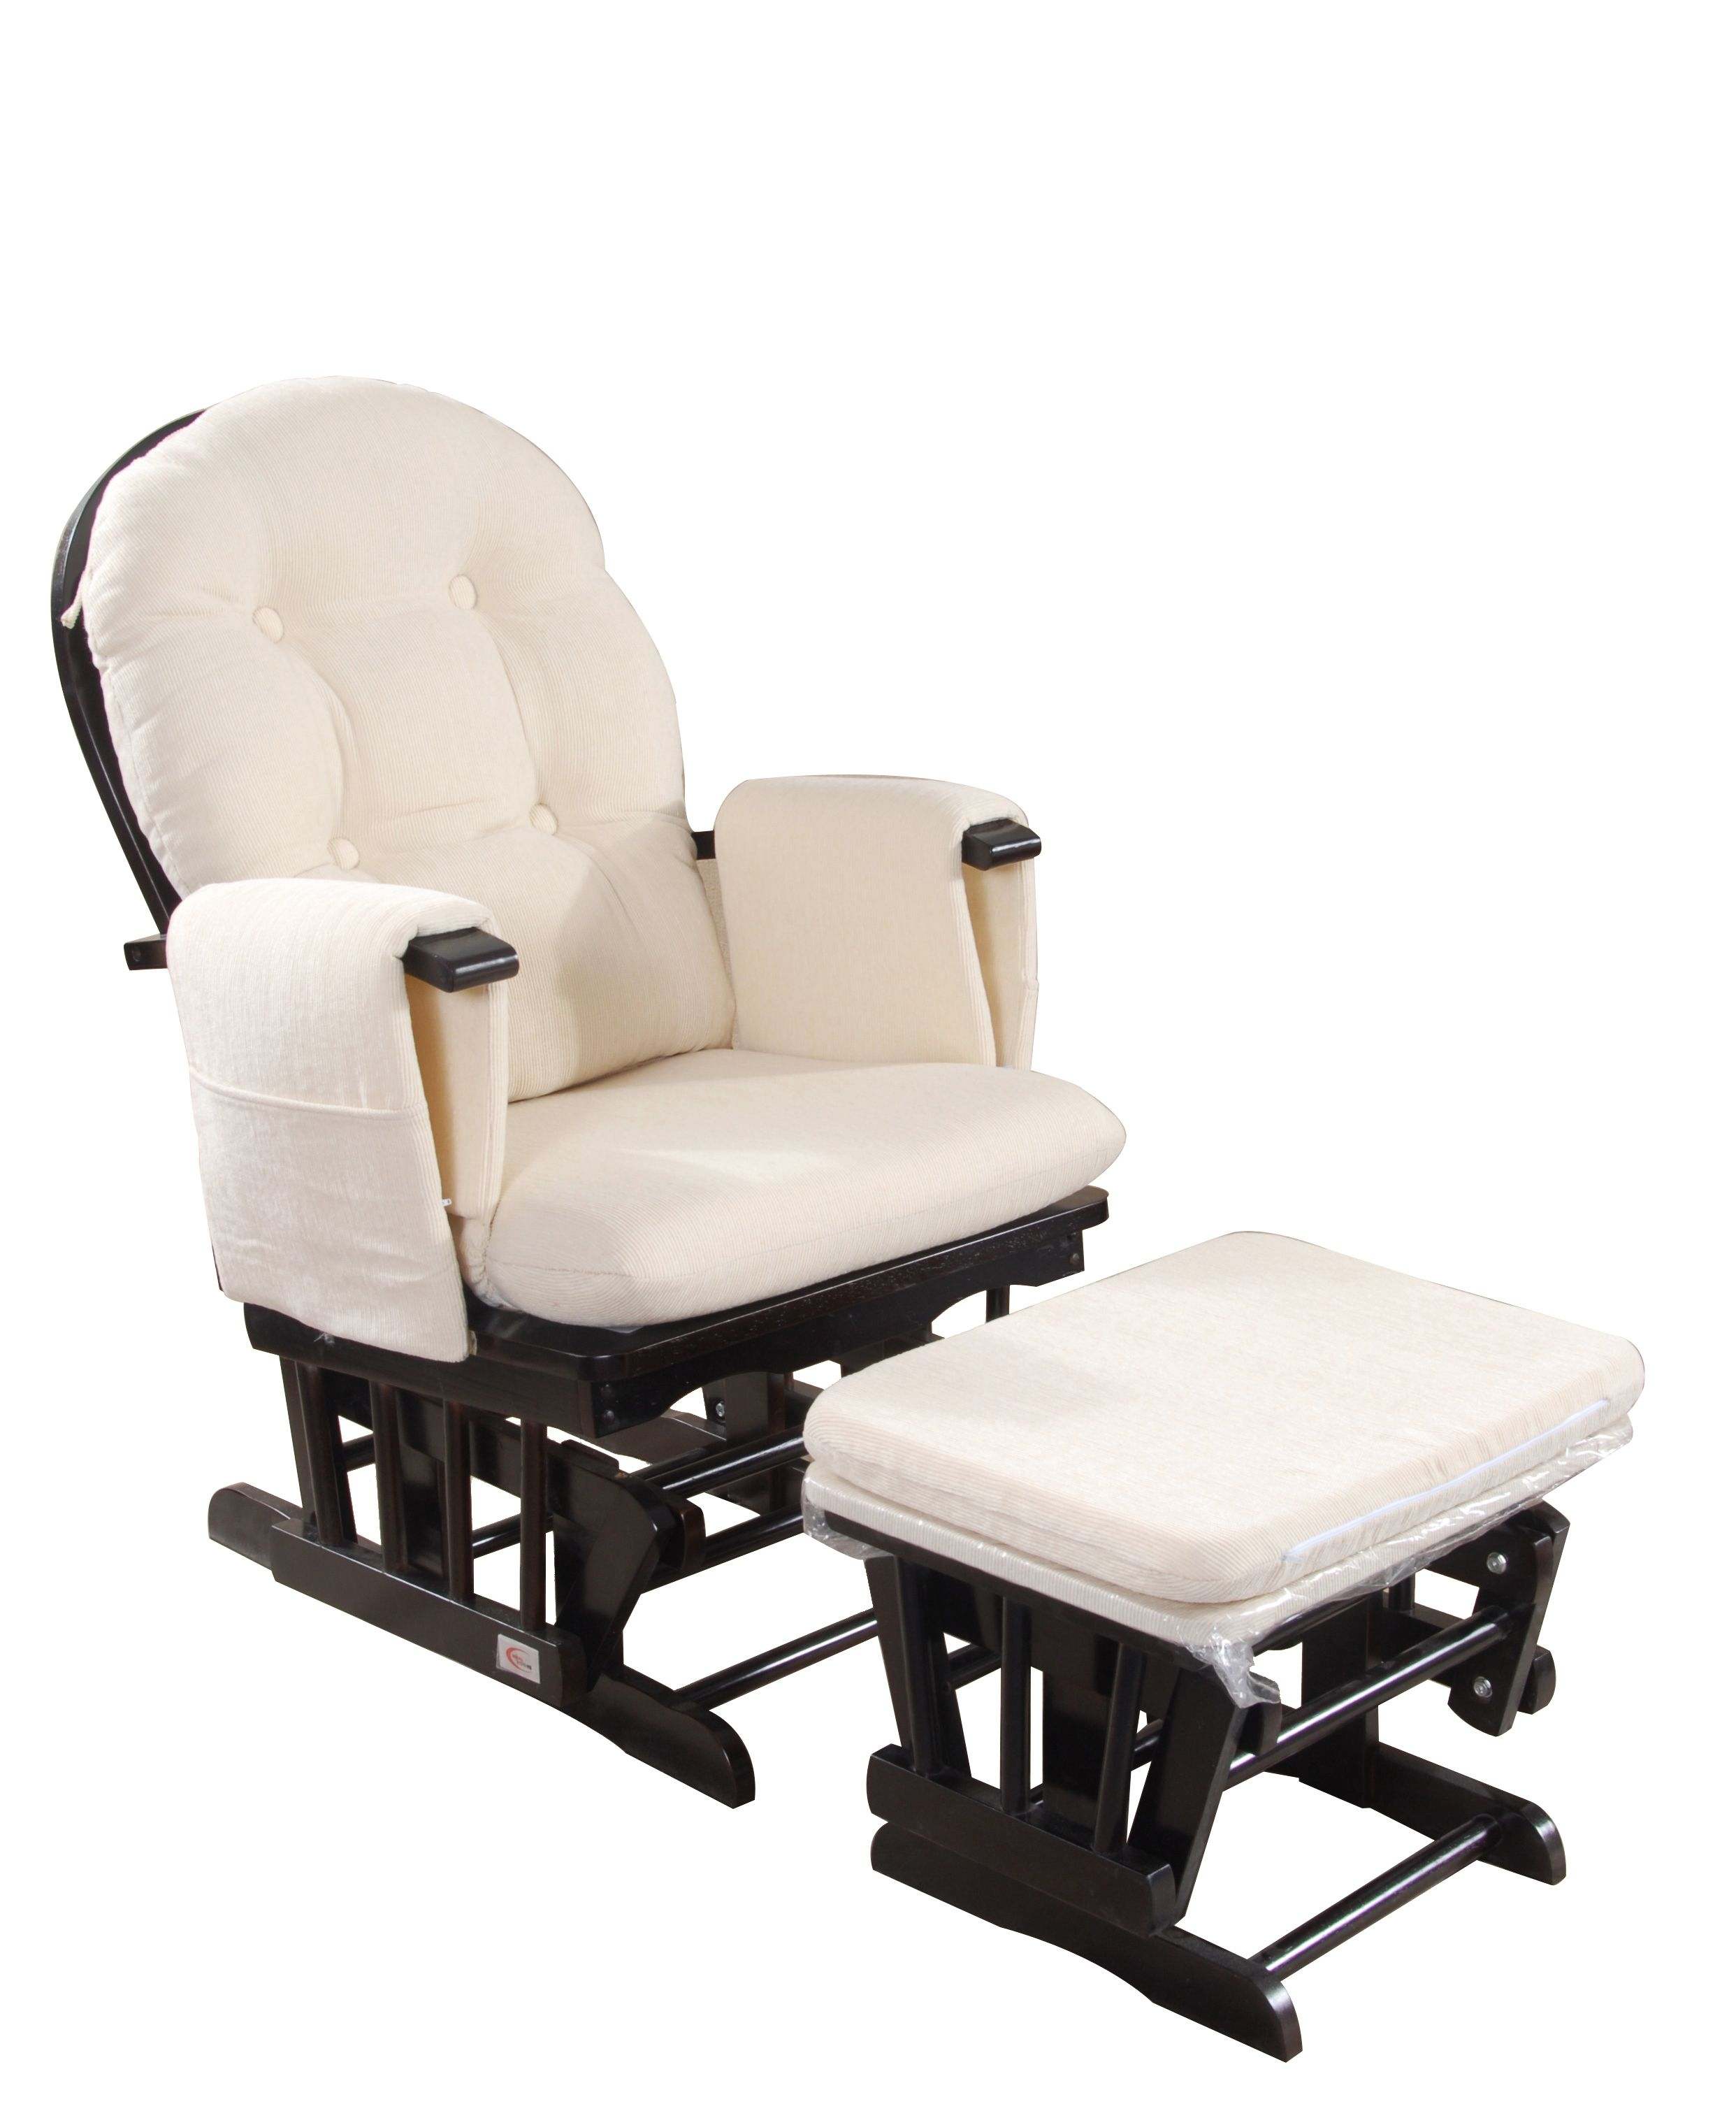 Kindergarten Fernsehsessel Stuhl Sessel Glider Rocker Kinderzimmer